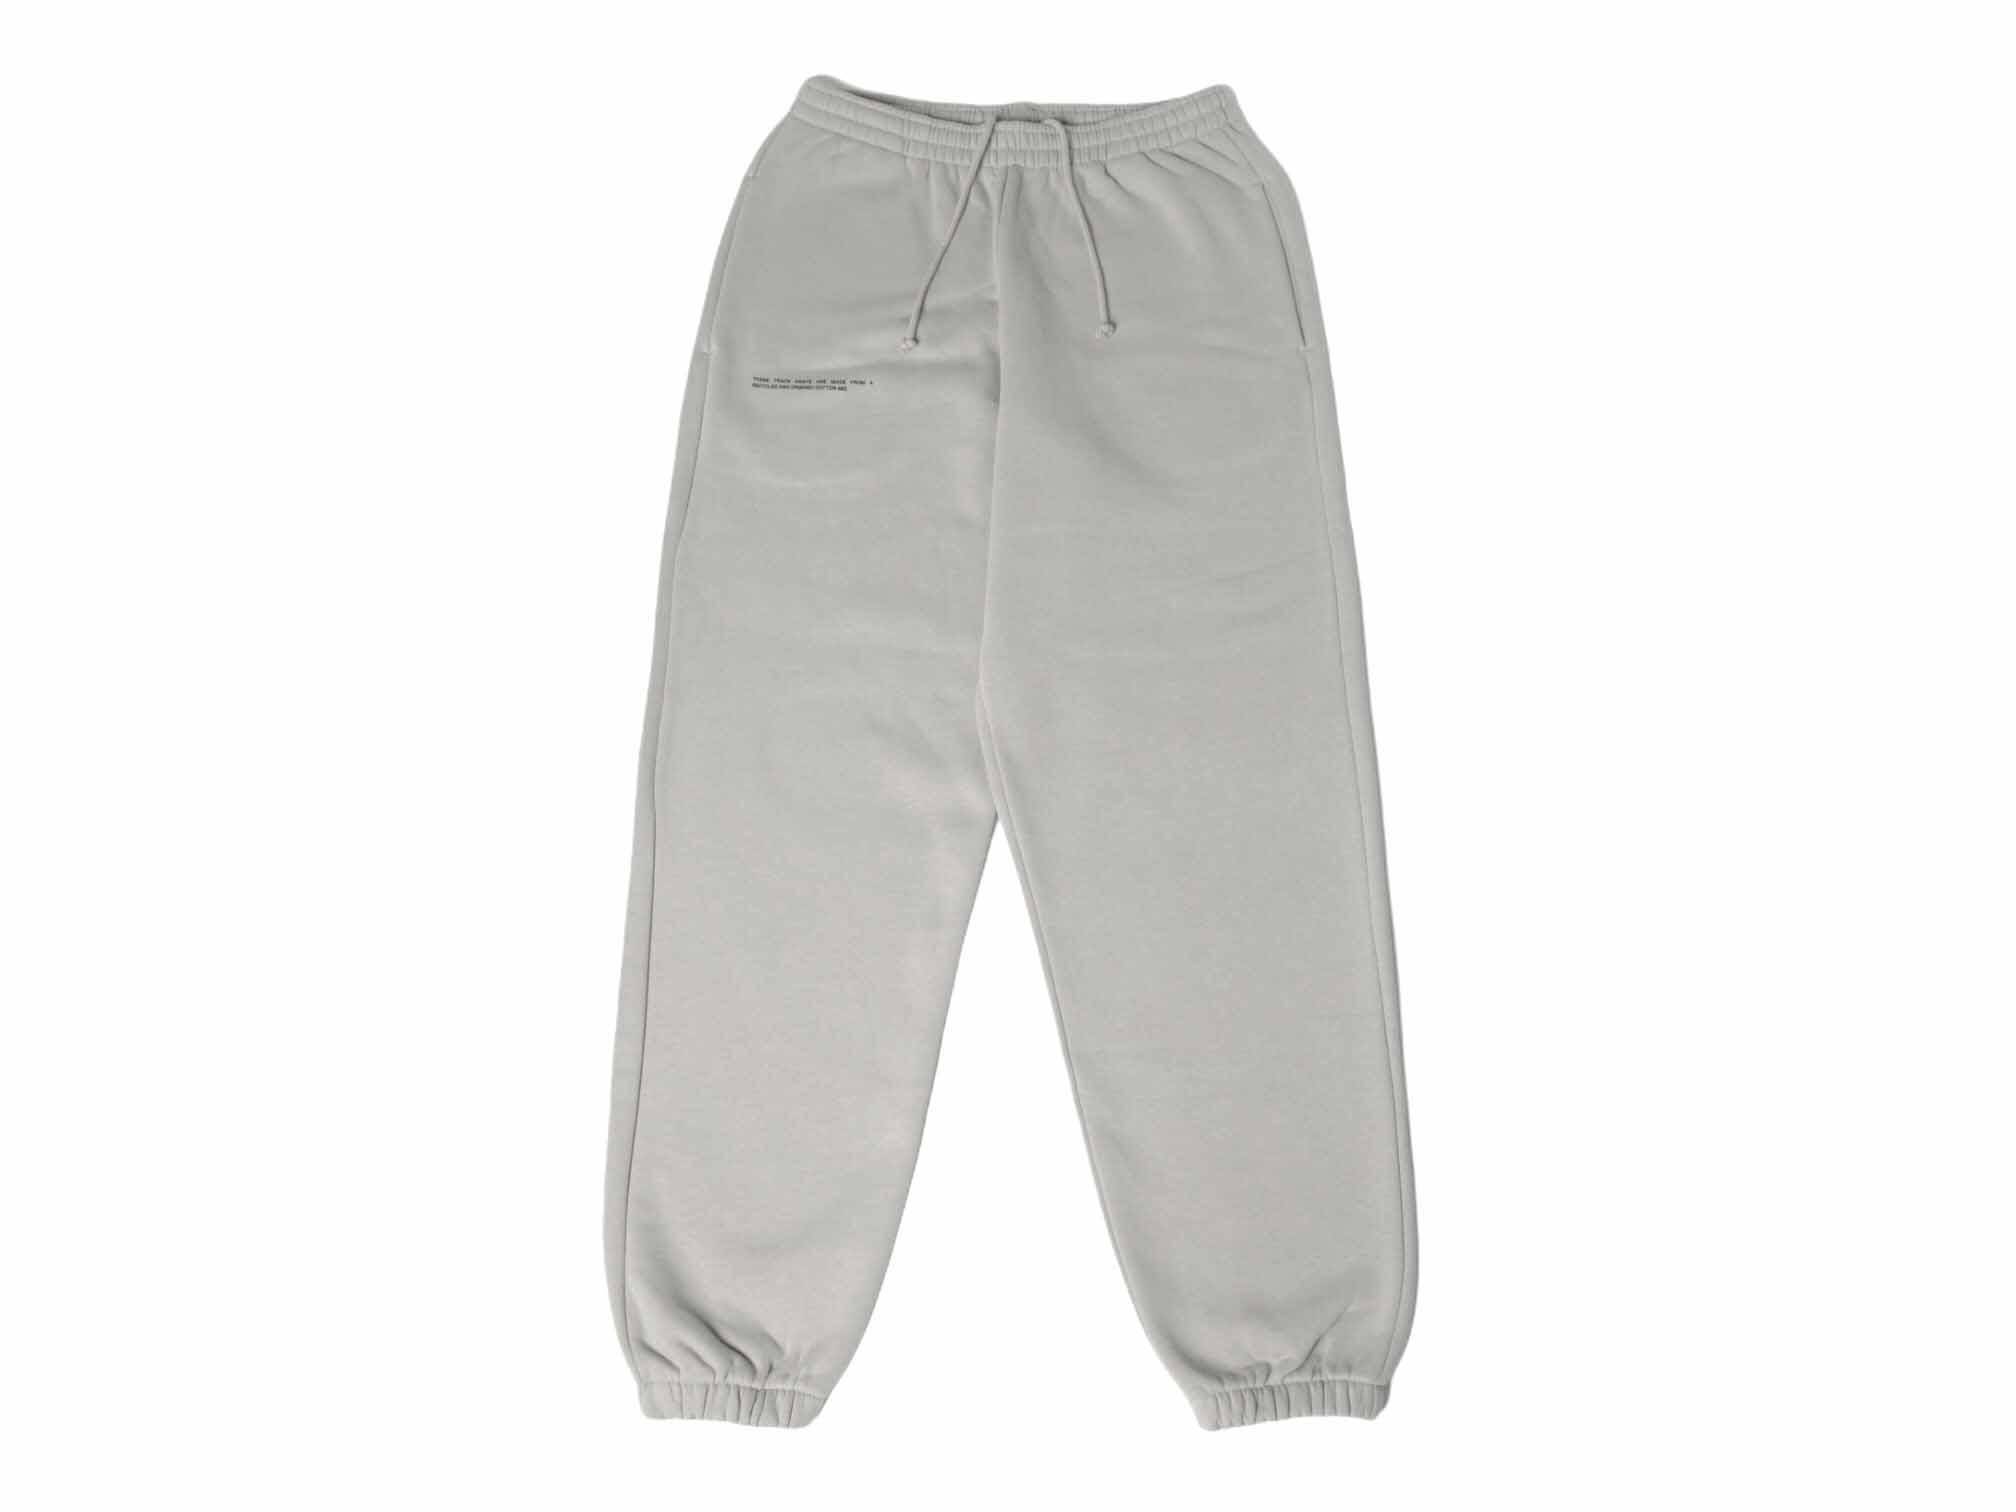 slide 1 - Cotton Track Pants - Stone